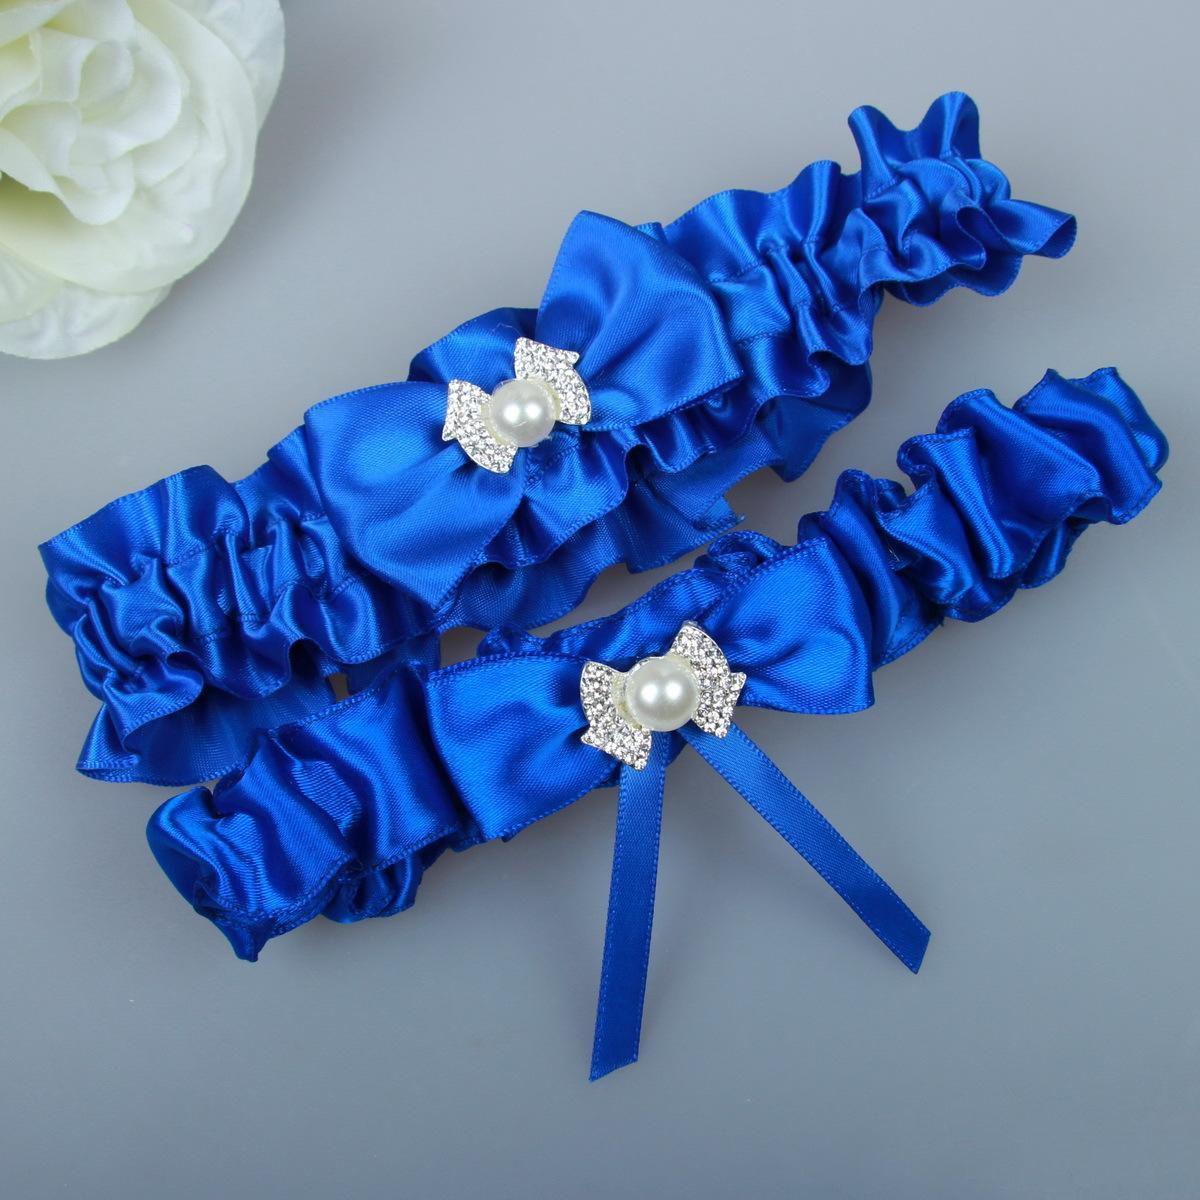 Satin Bridal Garts Royal Blue Bow Wedding Leg Garter Set Vintage Belts Garters